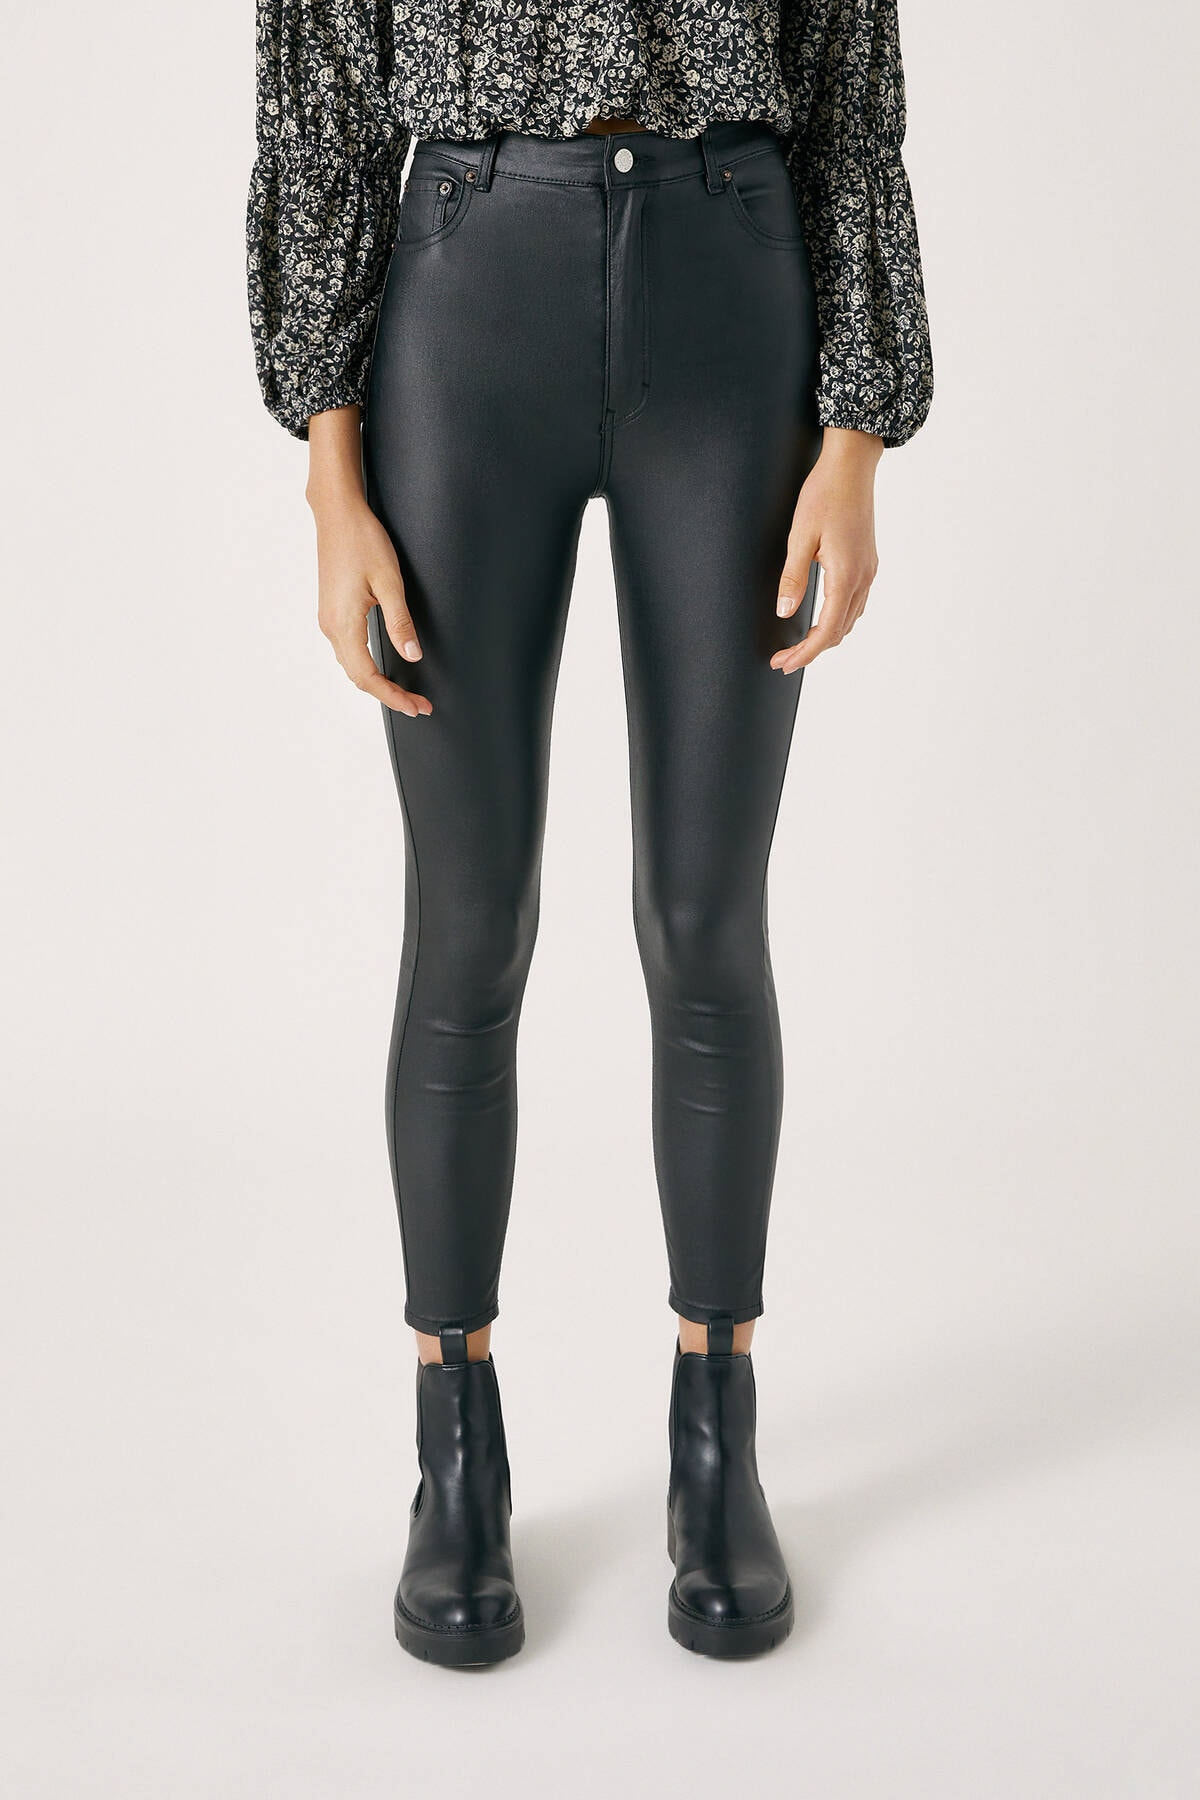 Pull & Bear Kadın Siyah High Waist Basic Jeans 09678311